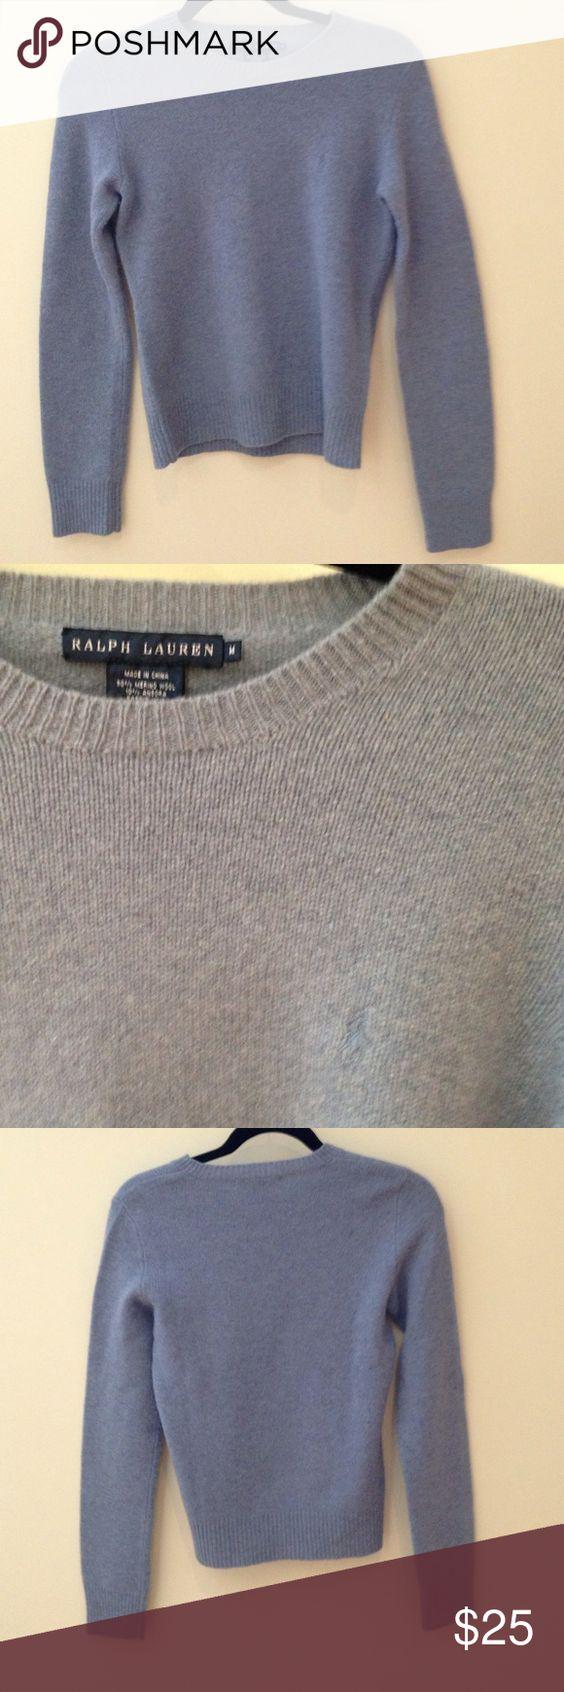 Ralph Lauren baby blue sweater 90% merino wool, 10% angora baby blue sweater. It has a small polo logo in the same color. Ralph Lauren Sweaters Crew & Scoop Necks